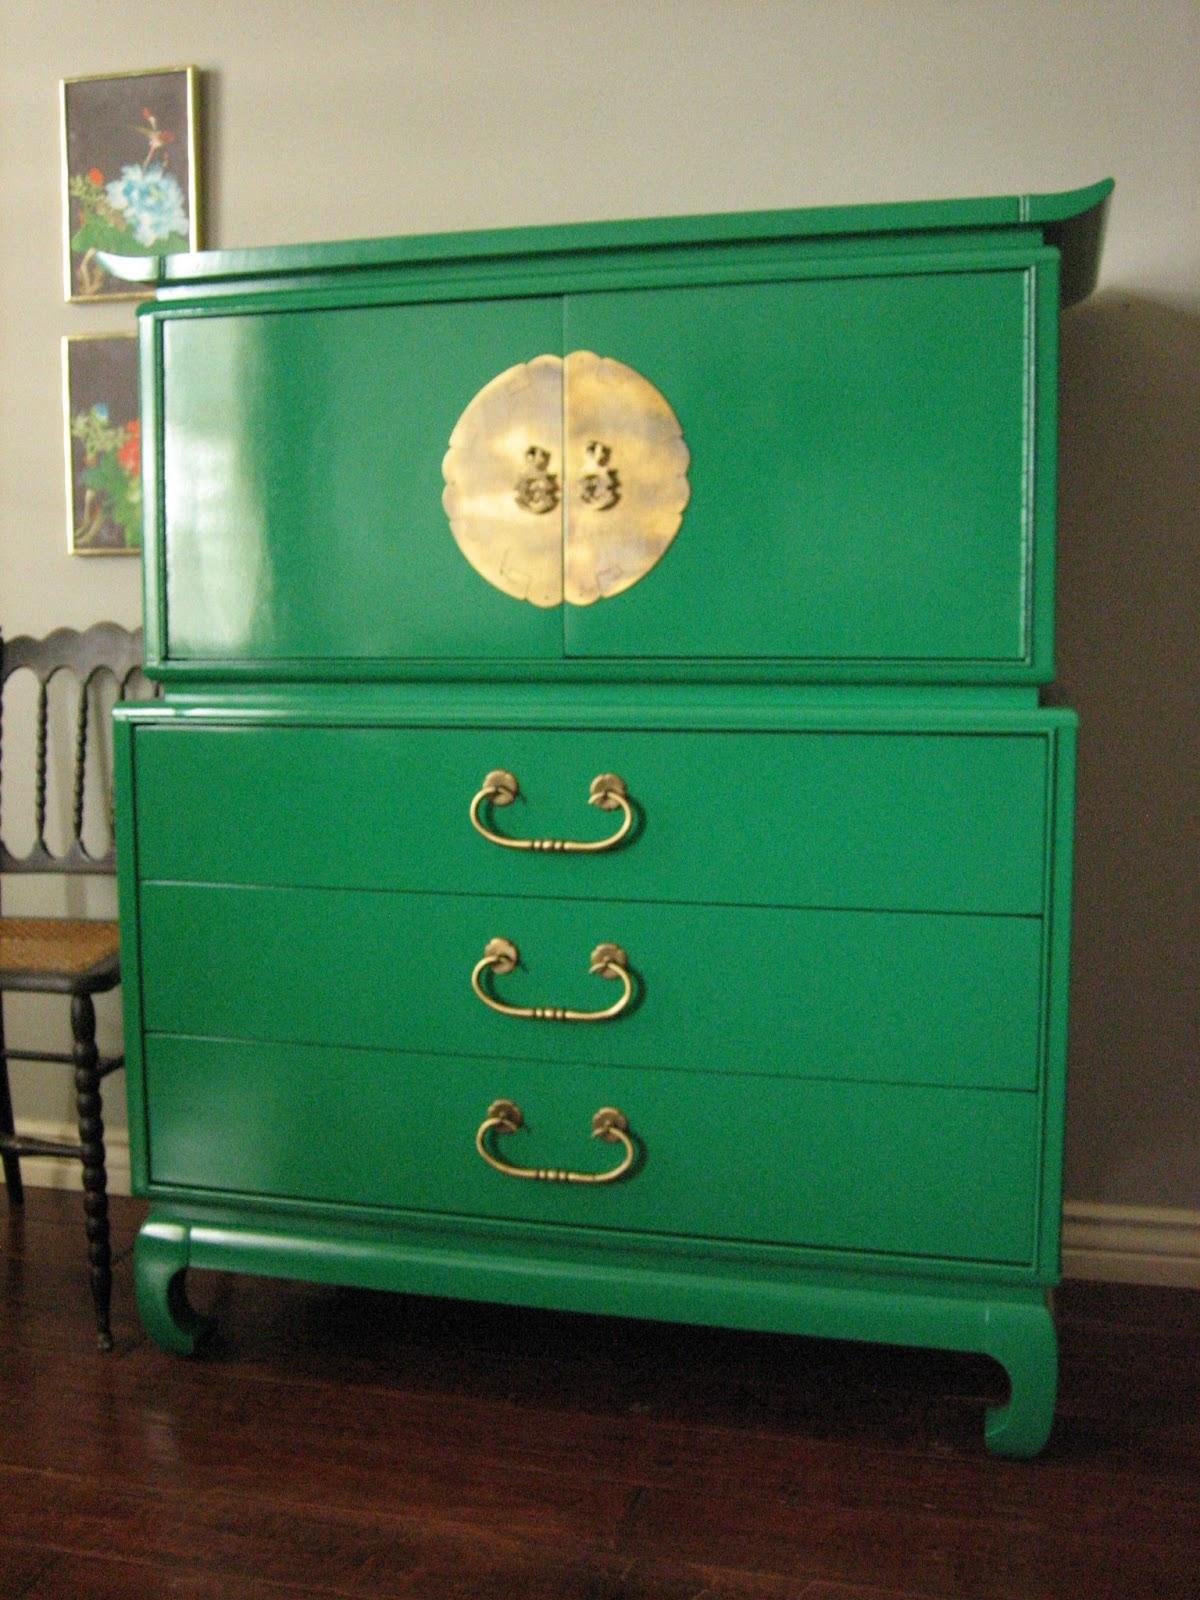 Euro European Paint Finishes Refinished Repurpose Furniture Dresser Vintage  Antique Glossy Glam Glamour Blog Diy Mcm Retro Modern Storage Cabinet  Armoire ...